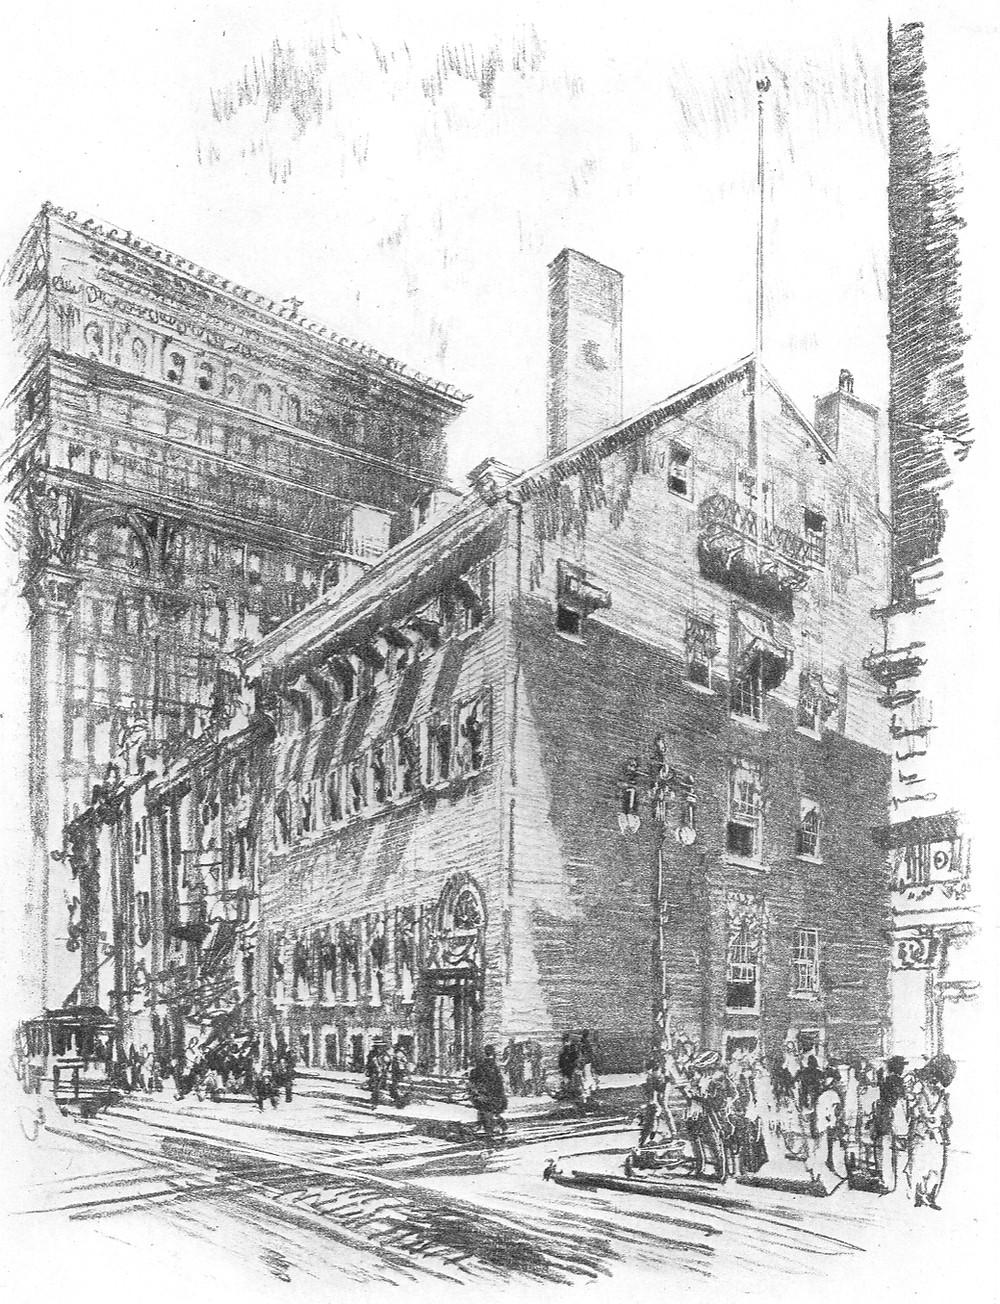 Philadelphia Club in 1914